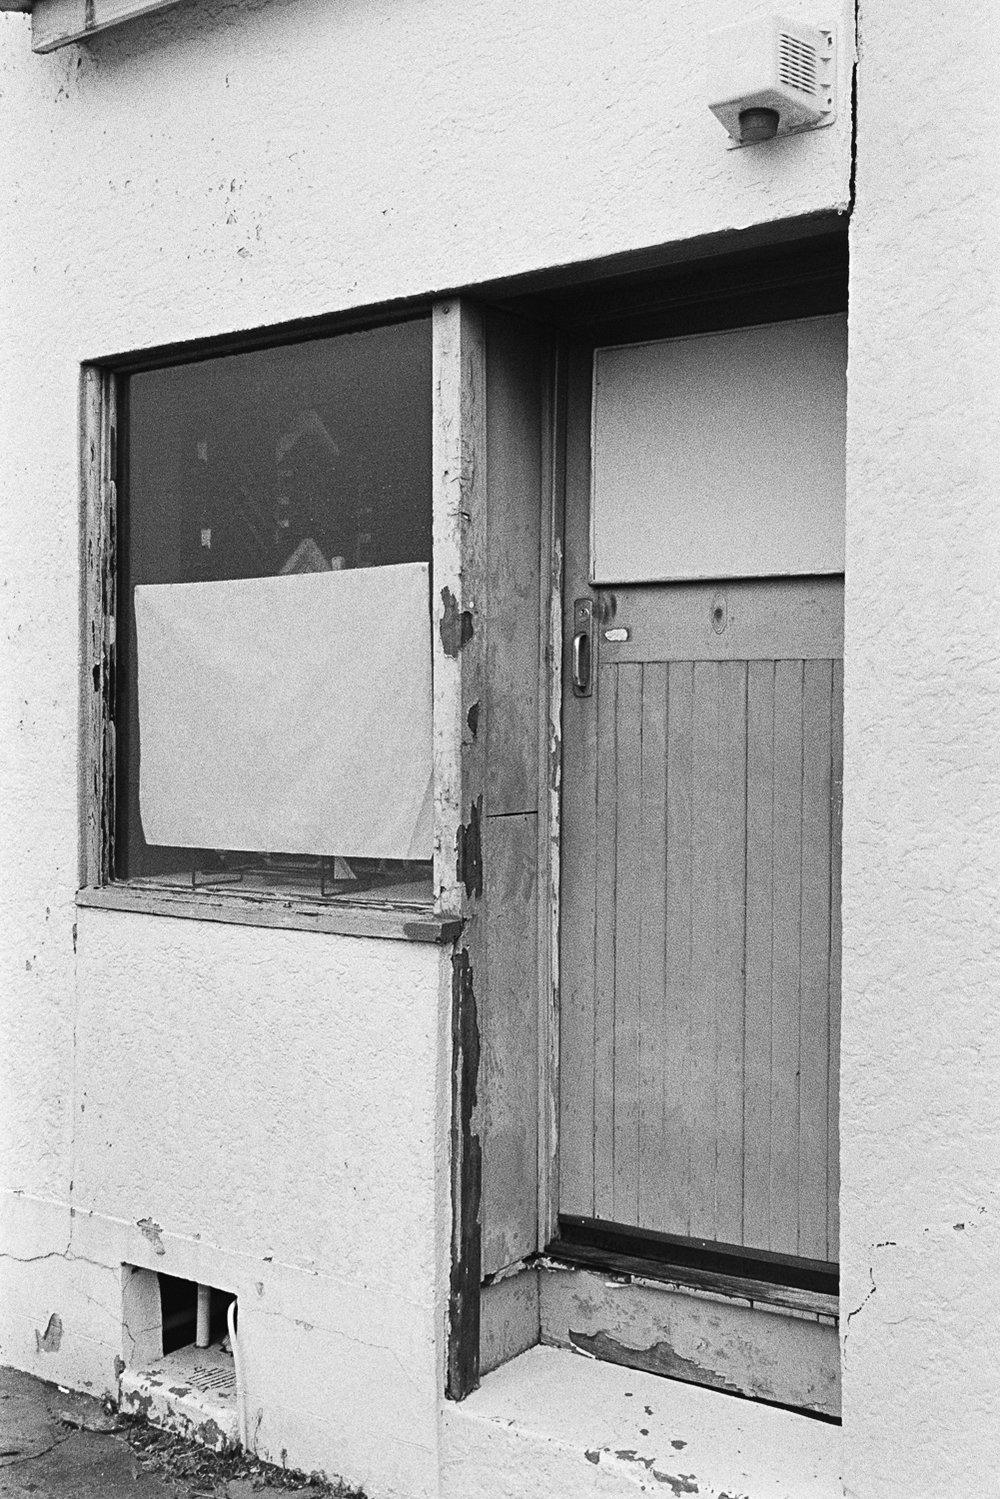 20181209 - Roll 267 - 035-Nick-Bedford,-Photographer-Black and White, Brisbane, Kodak TRI-X 400, Leica M7, Street Photography, Voigtlander 35mm F1.7.jpg